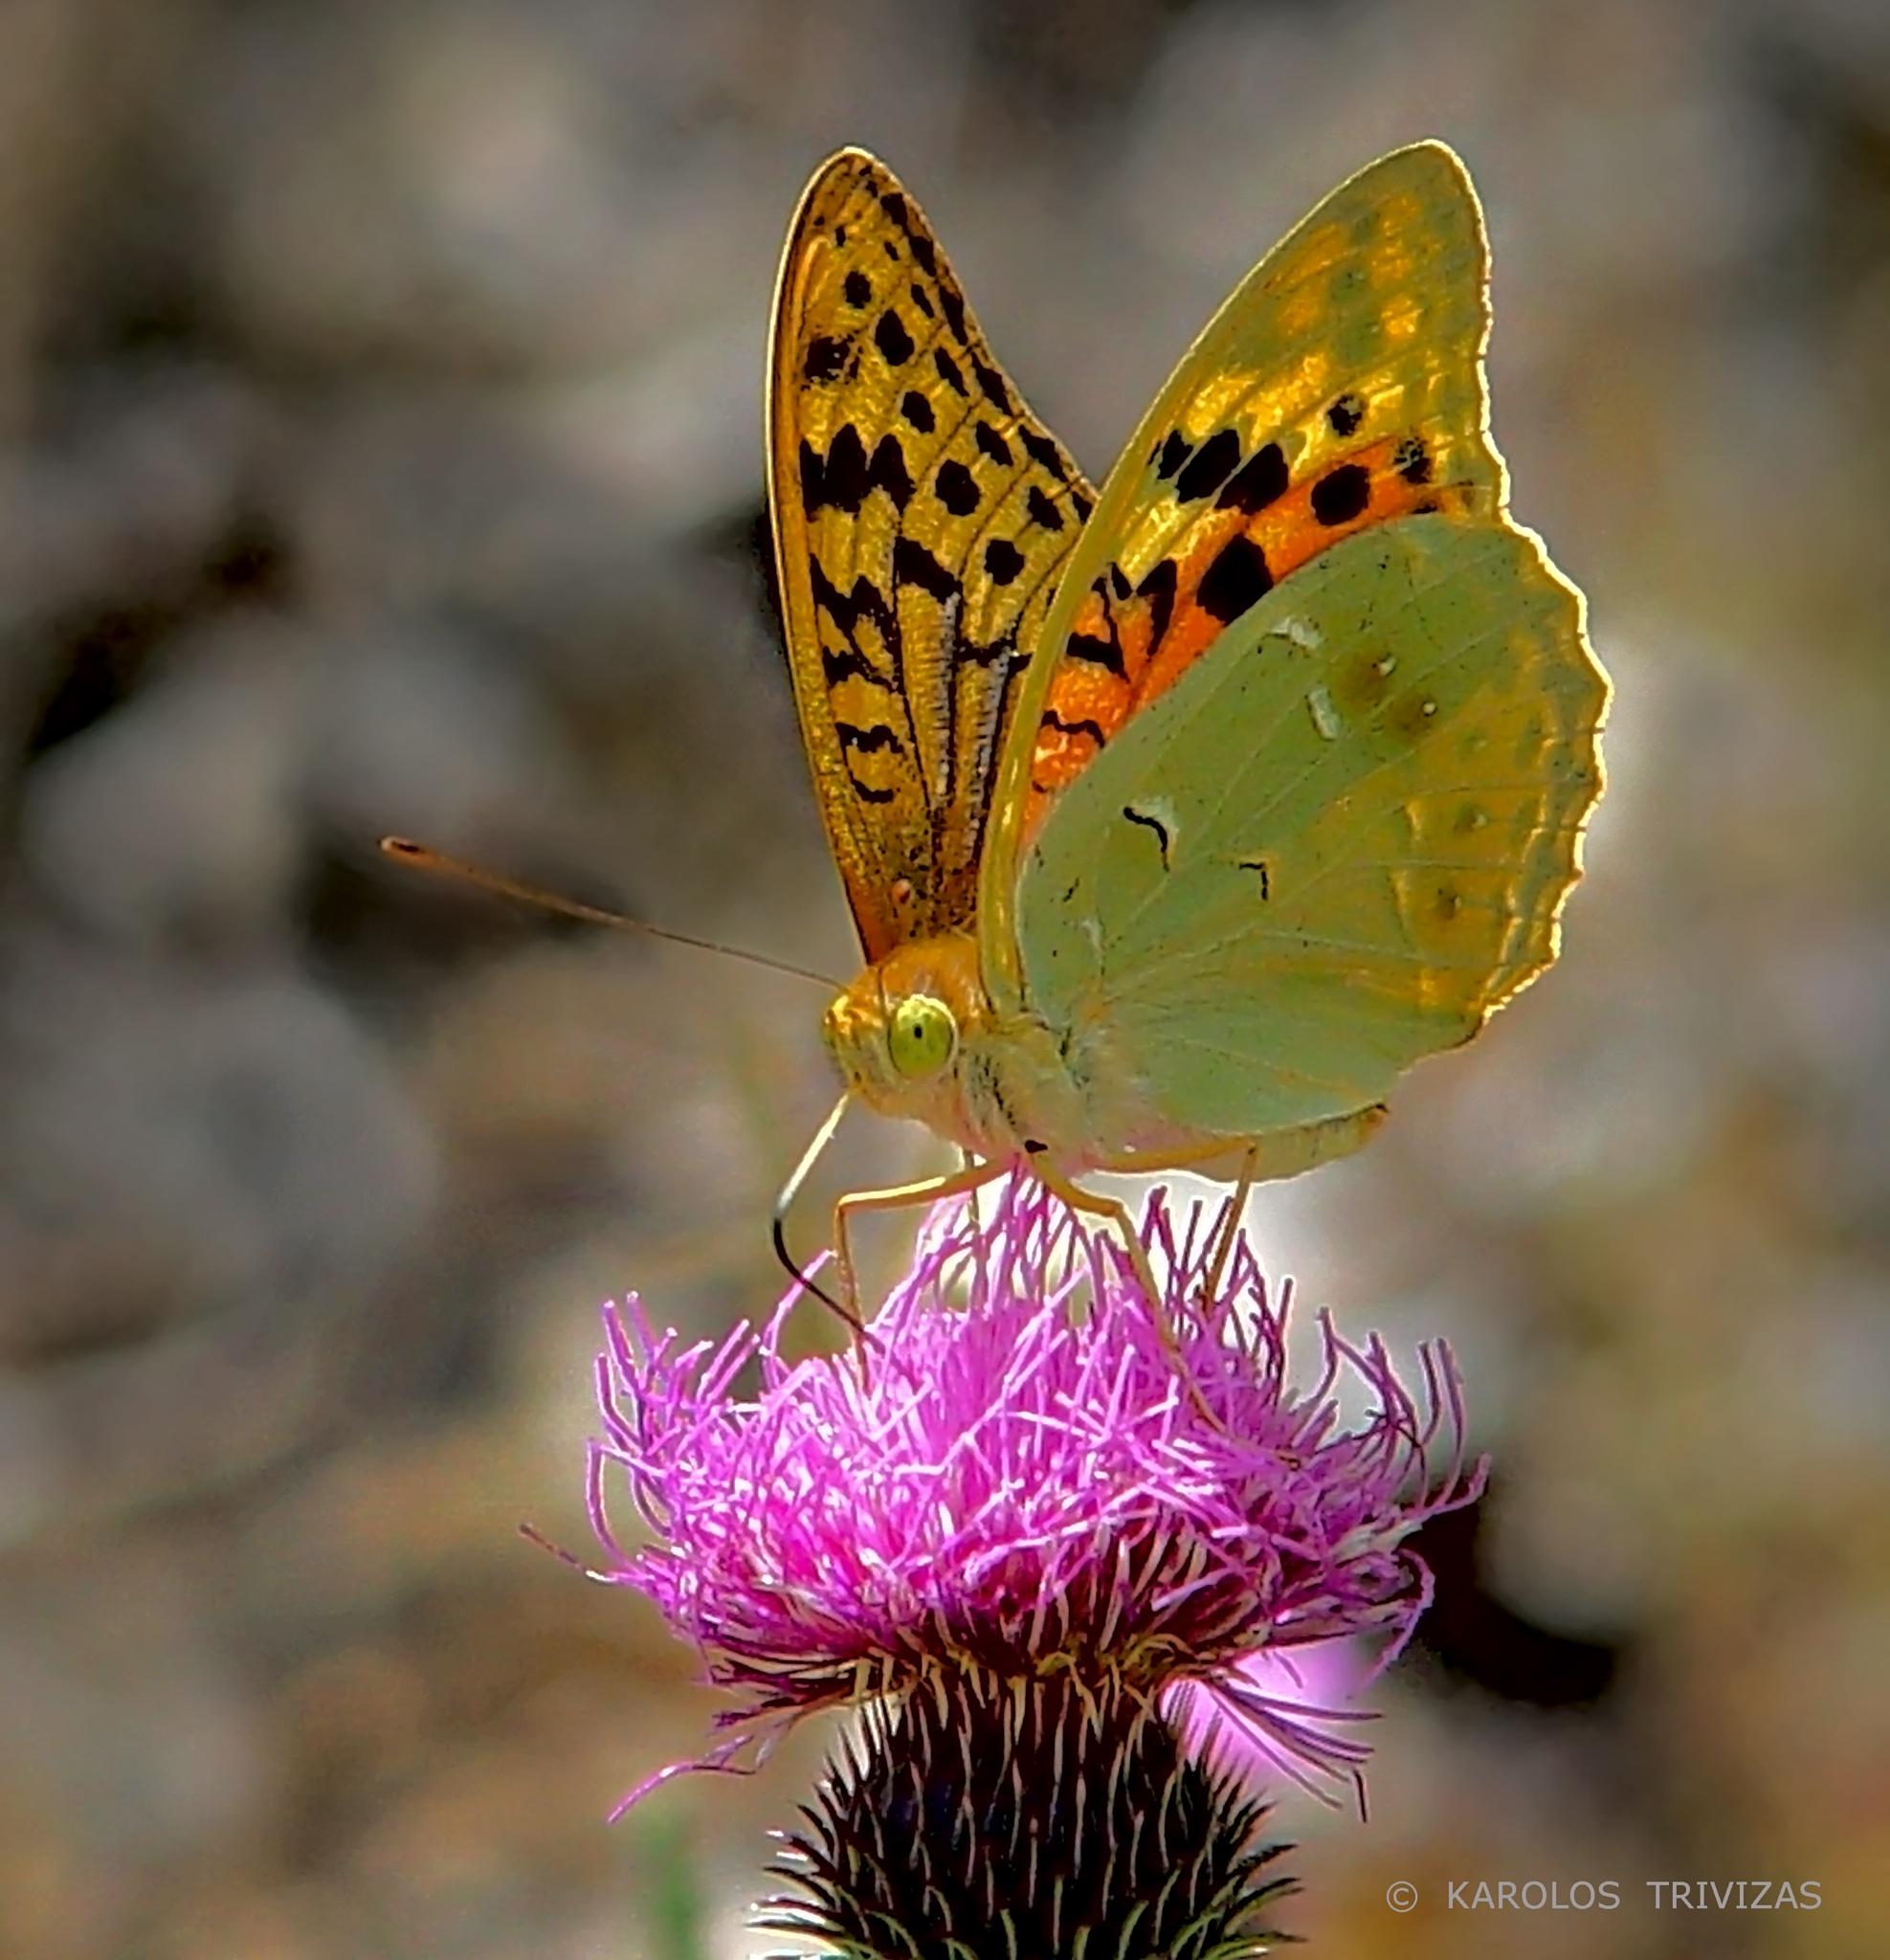 LYCAENA ON THORN FLOWER  (GREECE, MACEDONIA, DRAMA, PARANESTI, STRAVOREMA) by KAROLOS TRIVIZAS